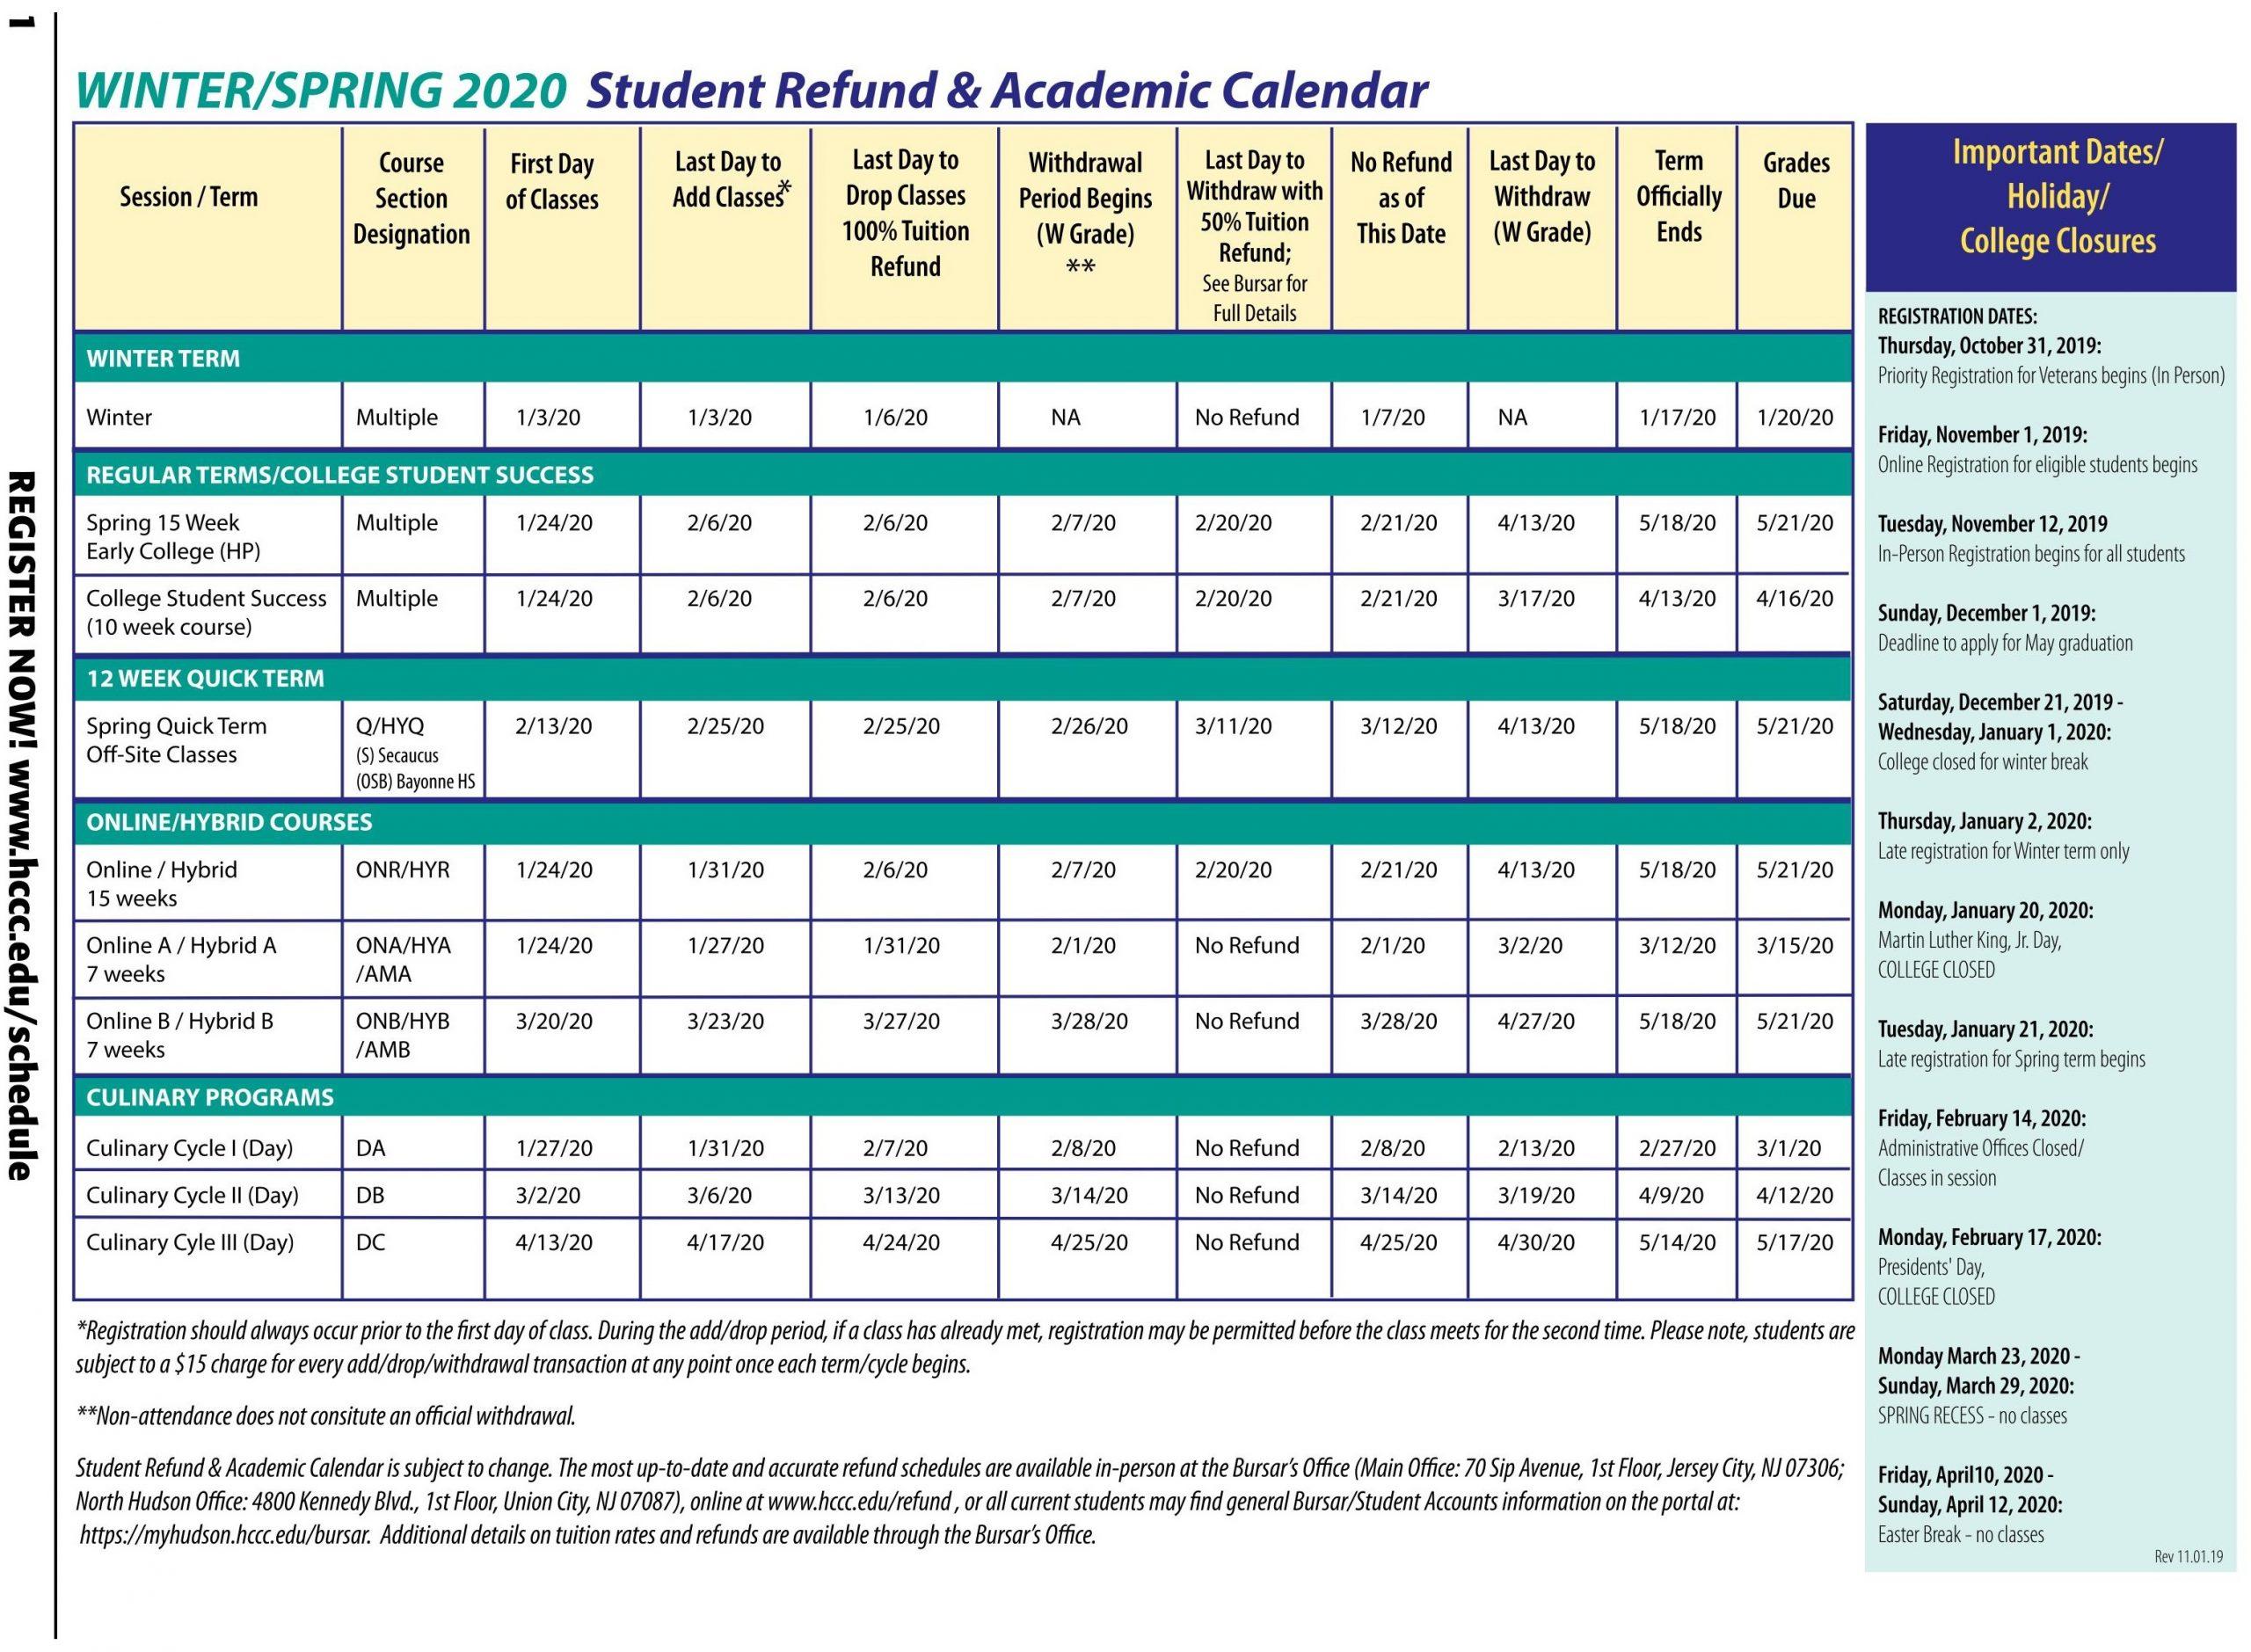 Fall Tv Line Up 2021 2020 Printable | Printable Calendar for Academic Calendar Nassau Community College 2021-2020